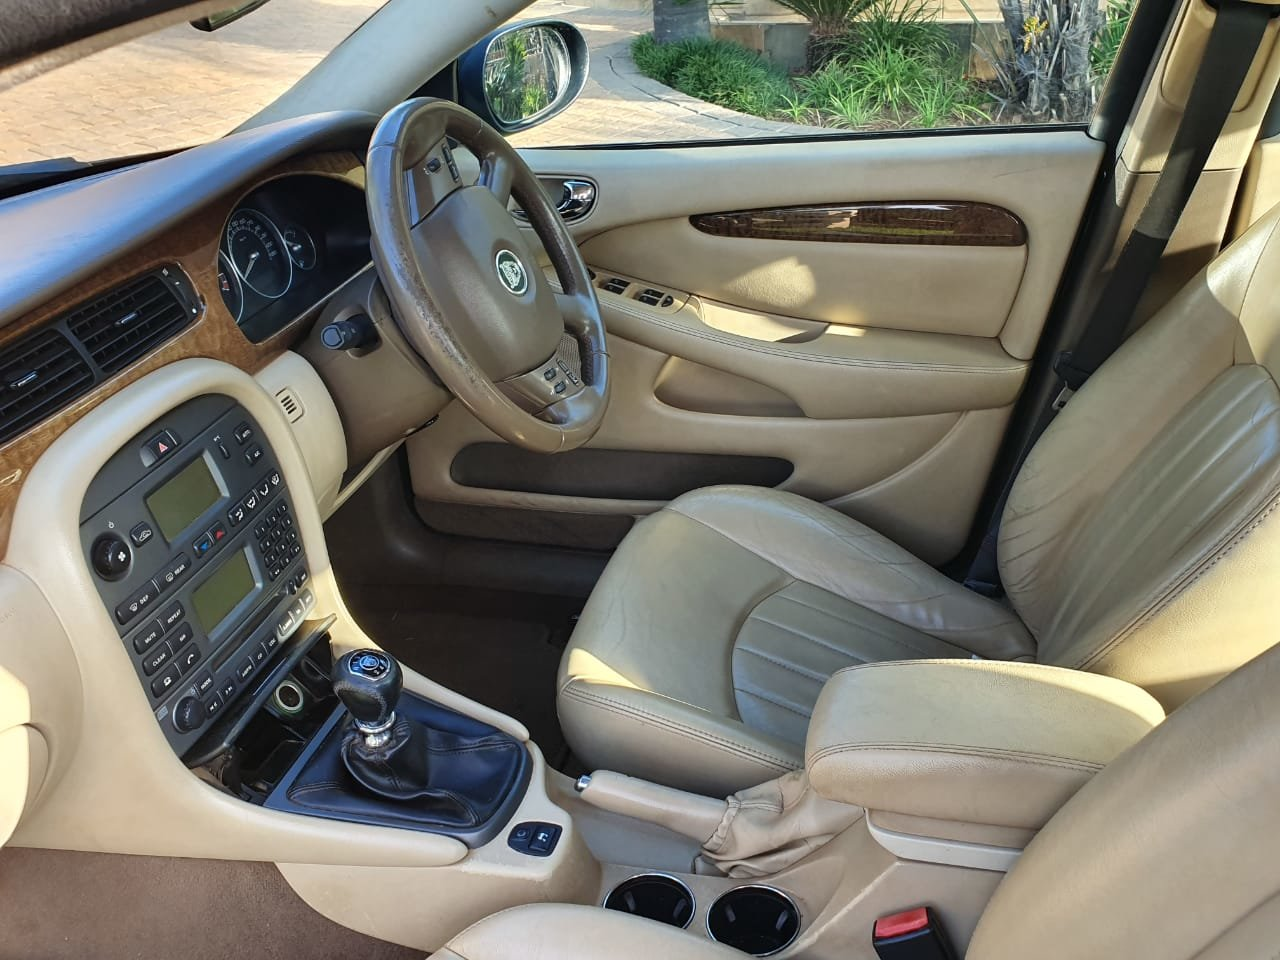 2006 Jaguar X Type Diesel 2.2  For Sale (picture 4 of 6)